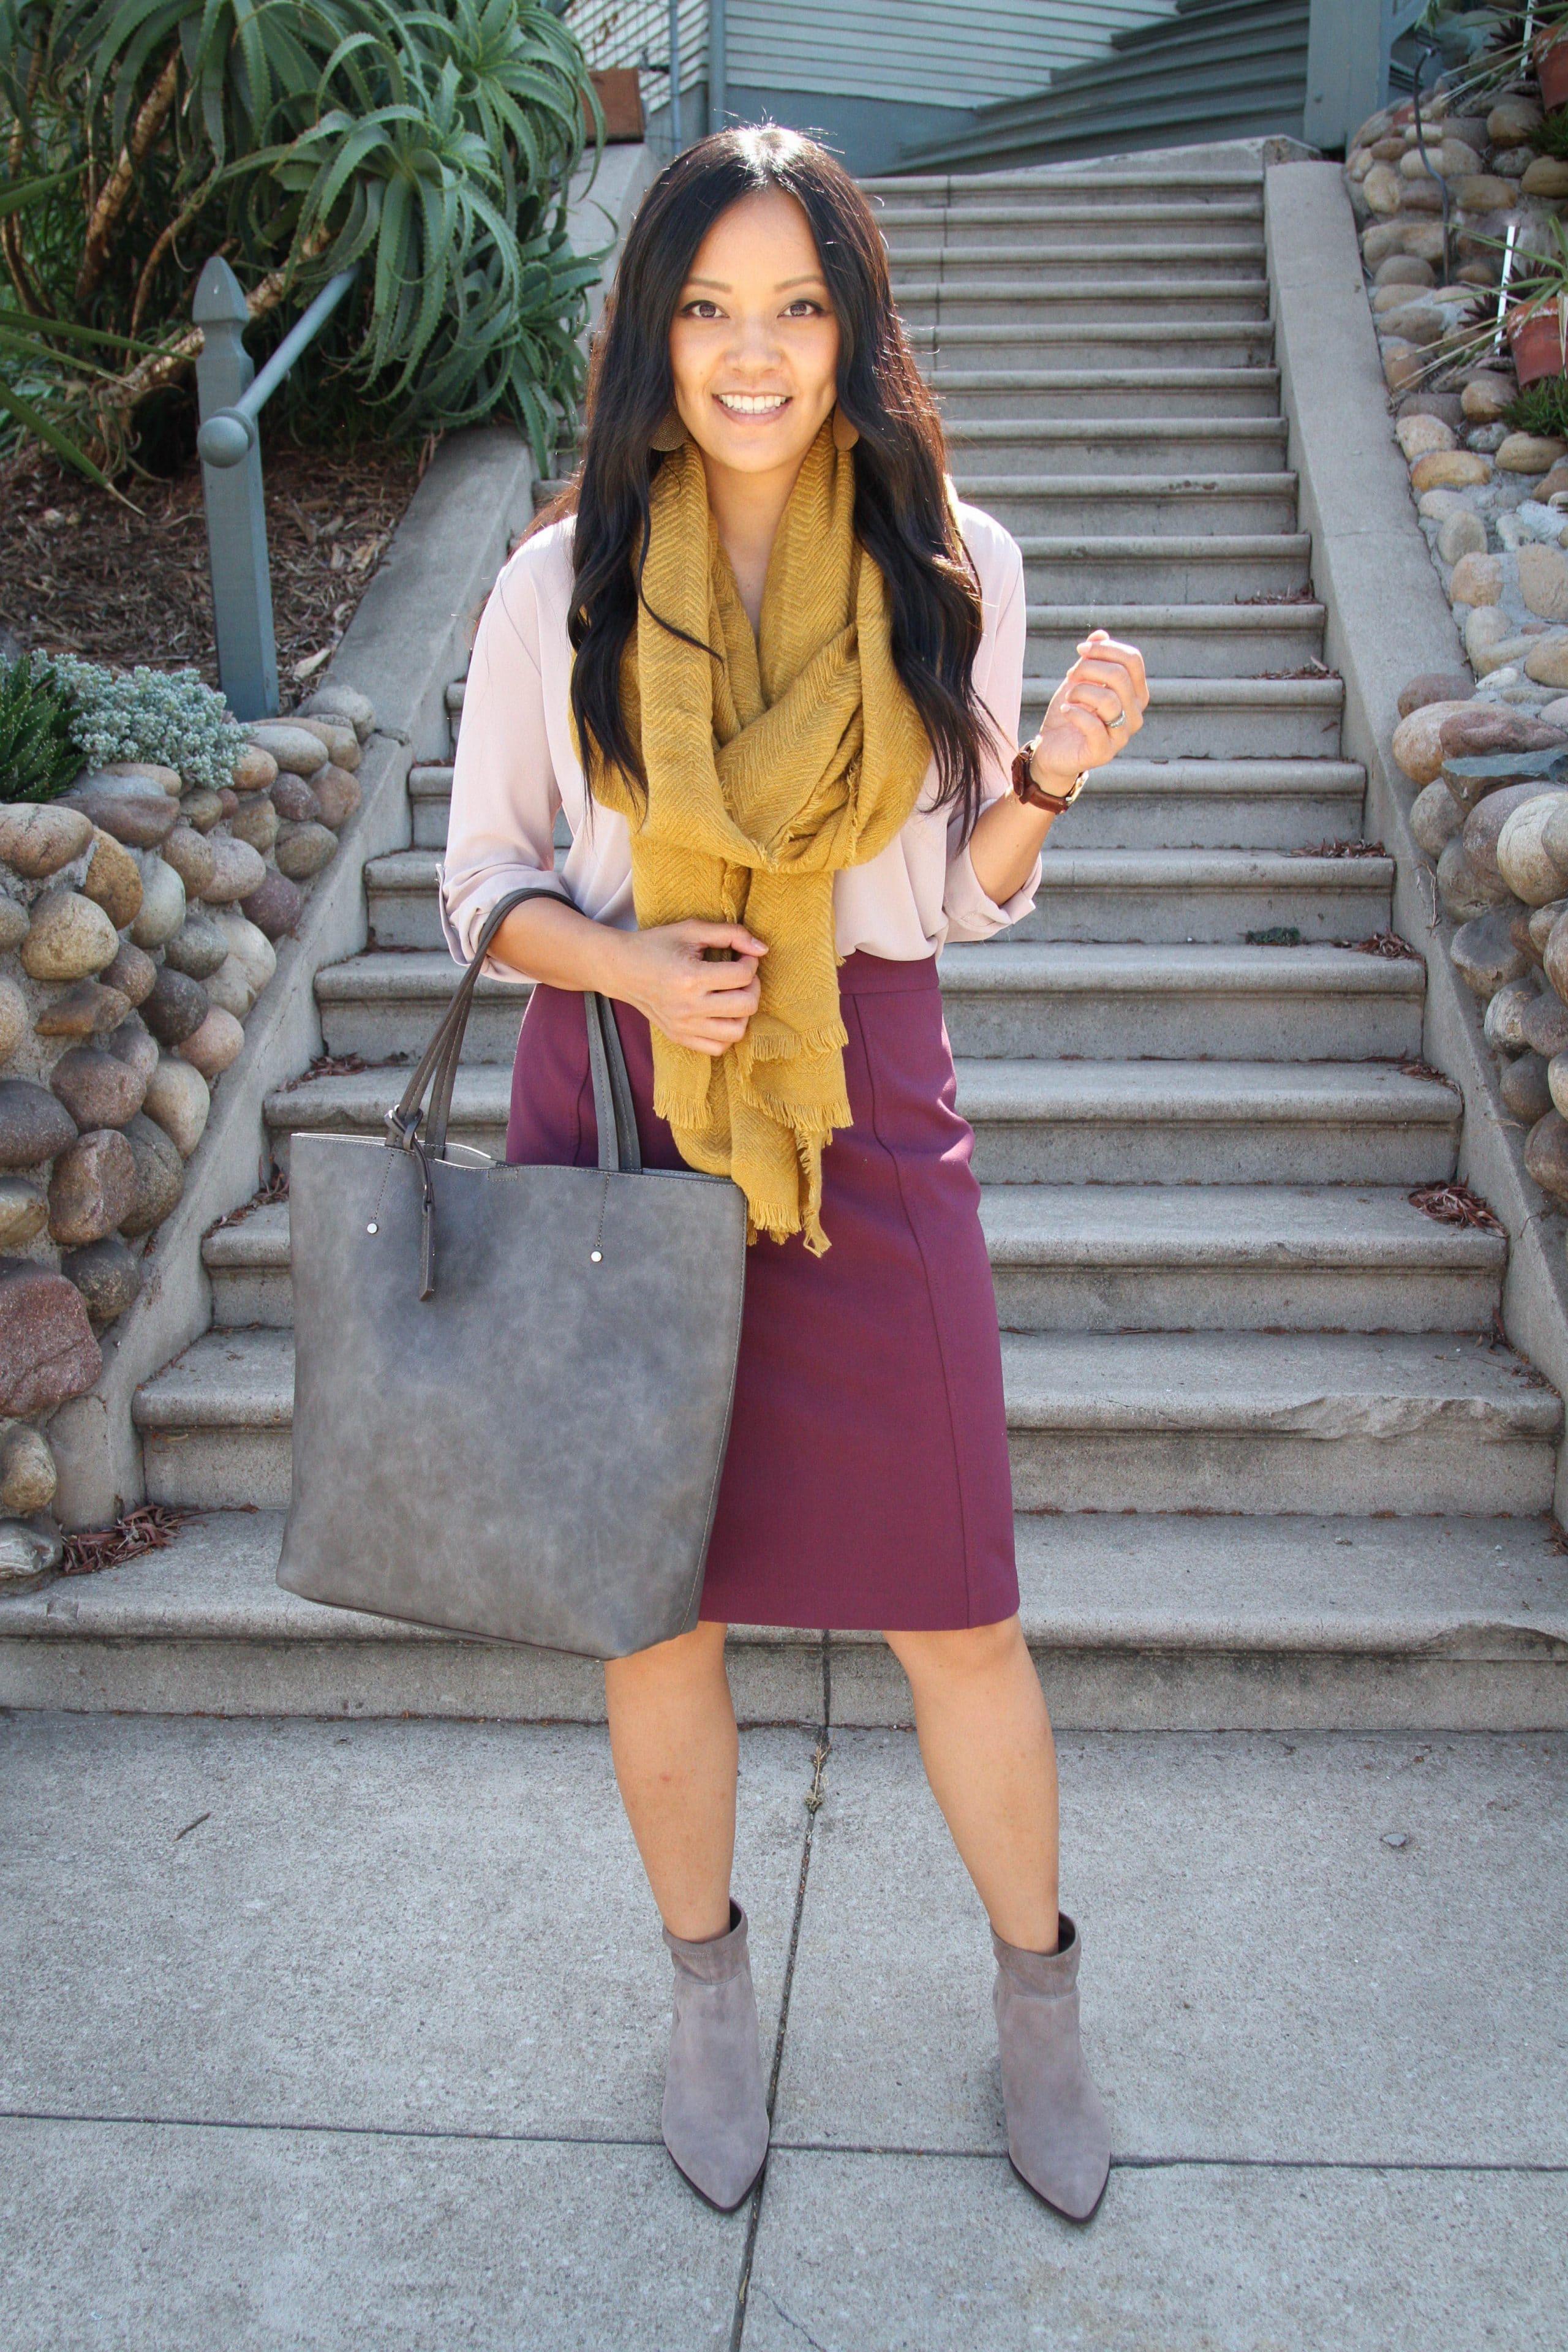 Mustard Scarf + Blush Top + Maroon Skirt + Gray Bag + Booties